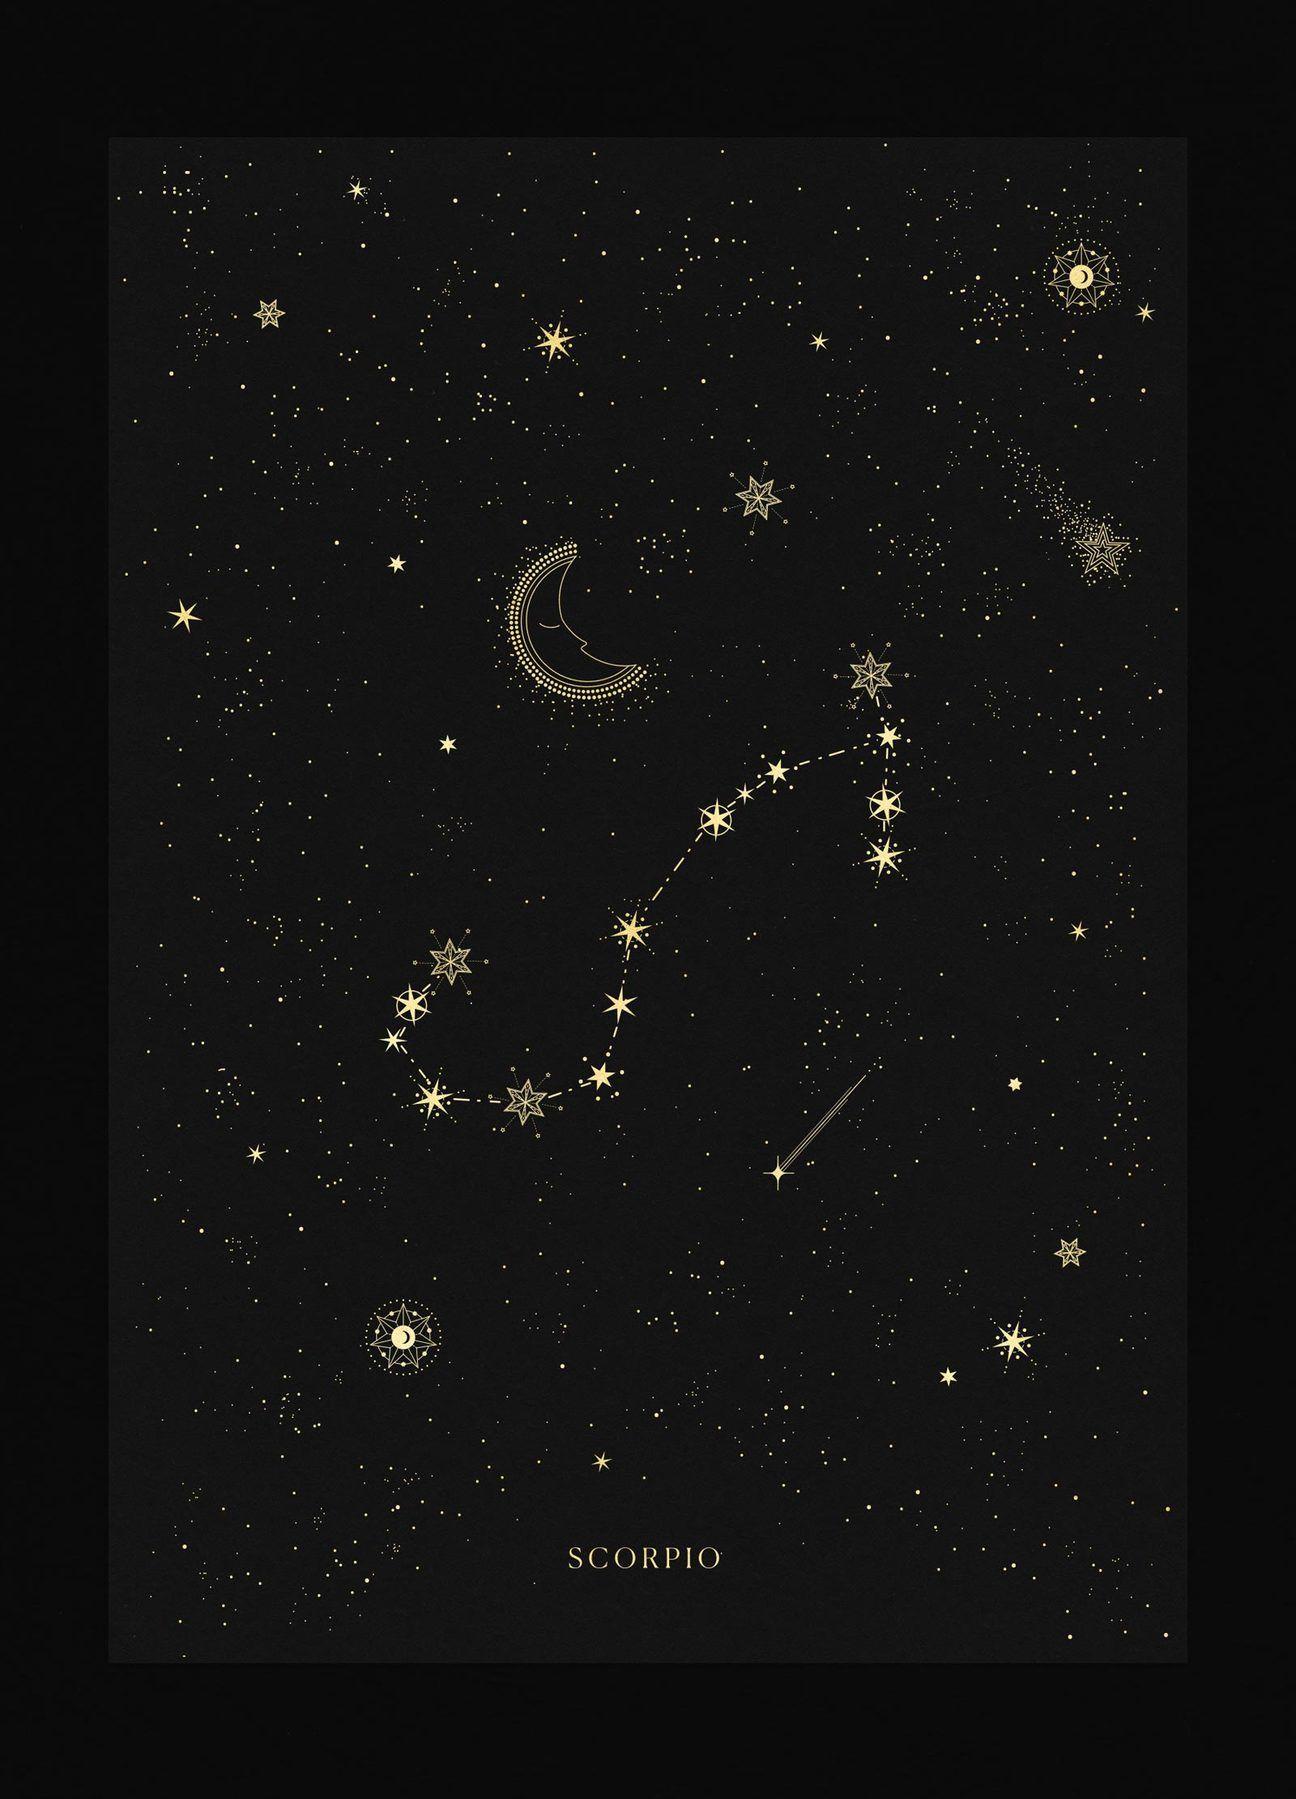 Scorpio Constellation Zodiac In 2019 Cancer